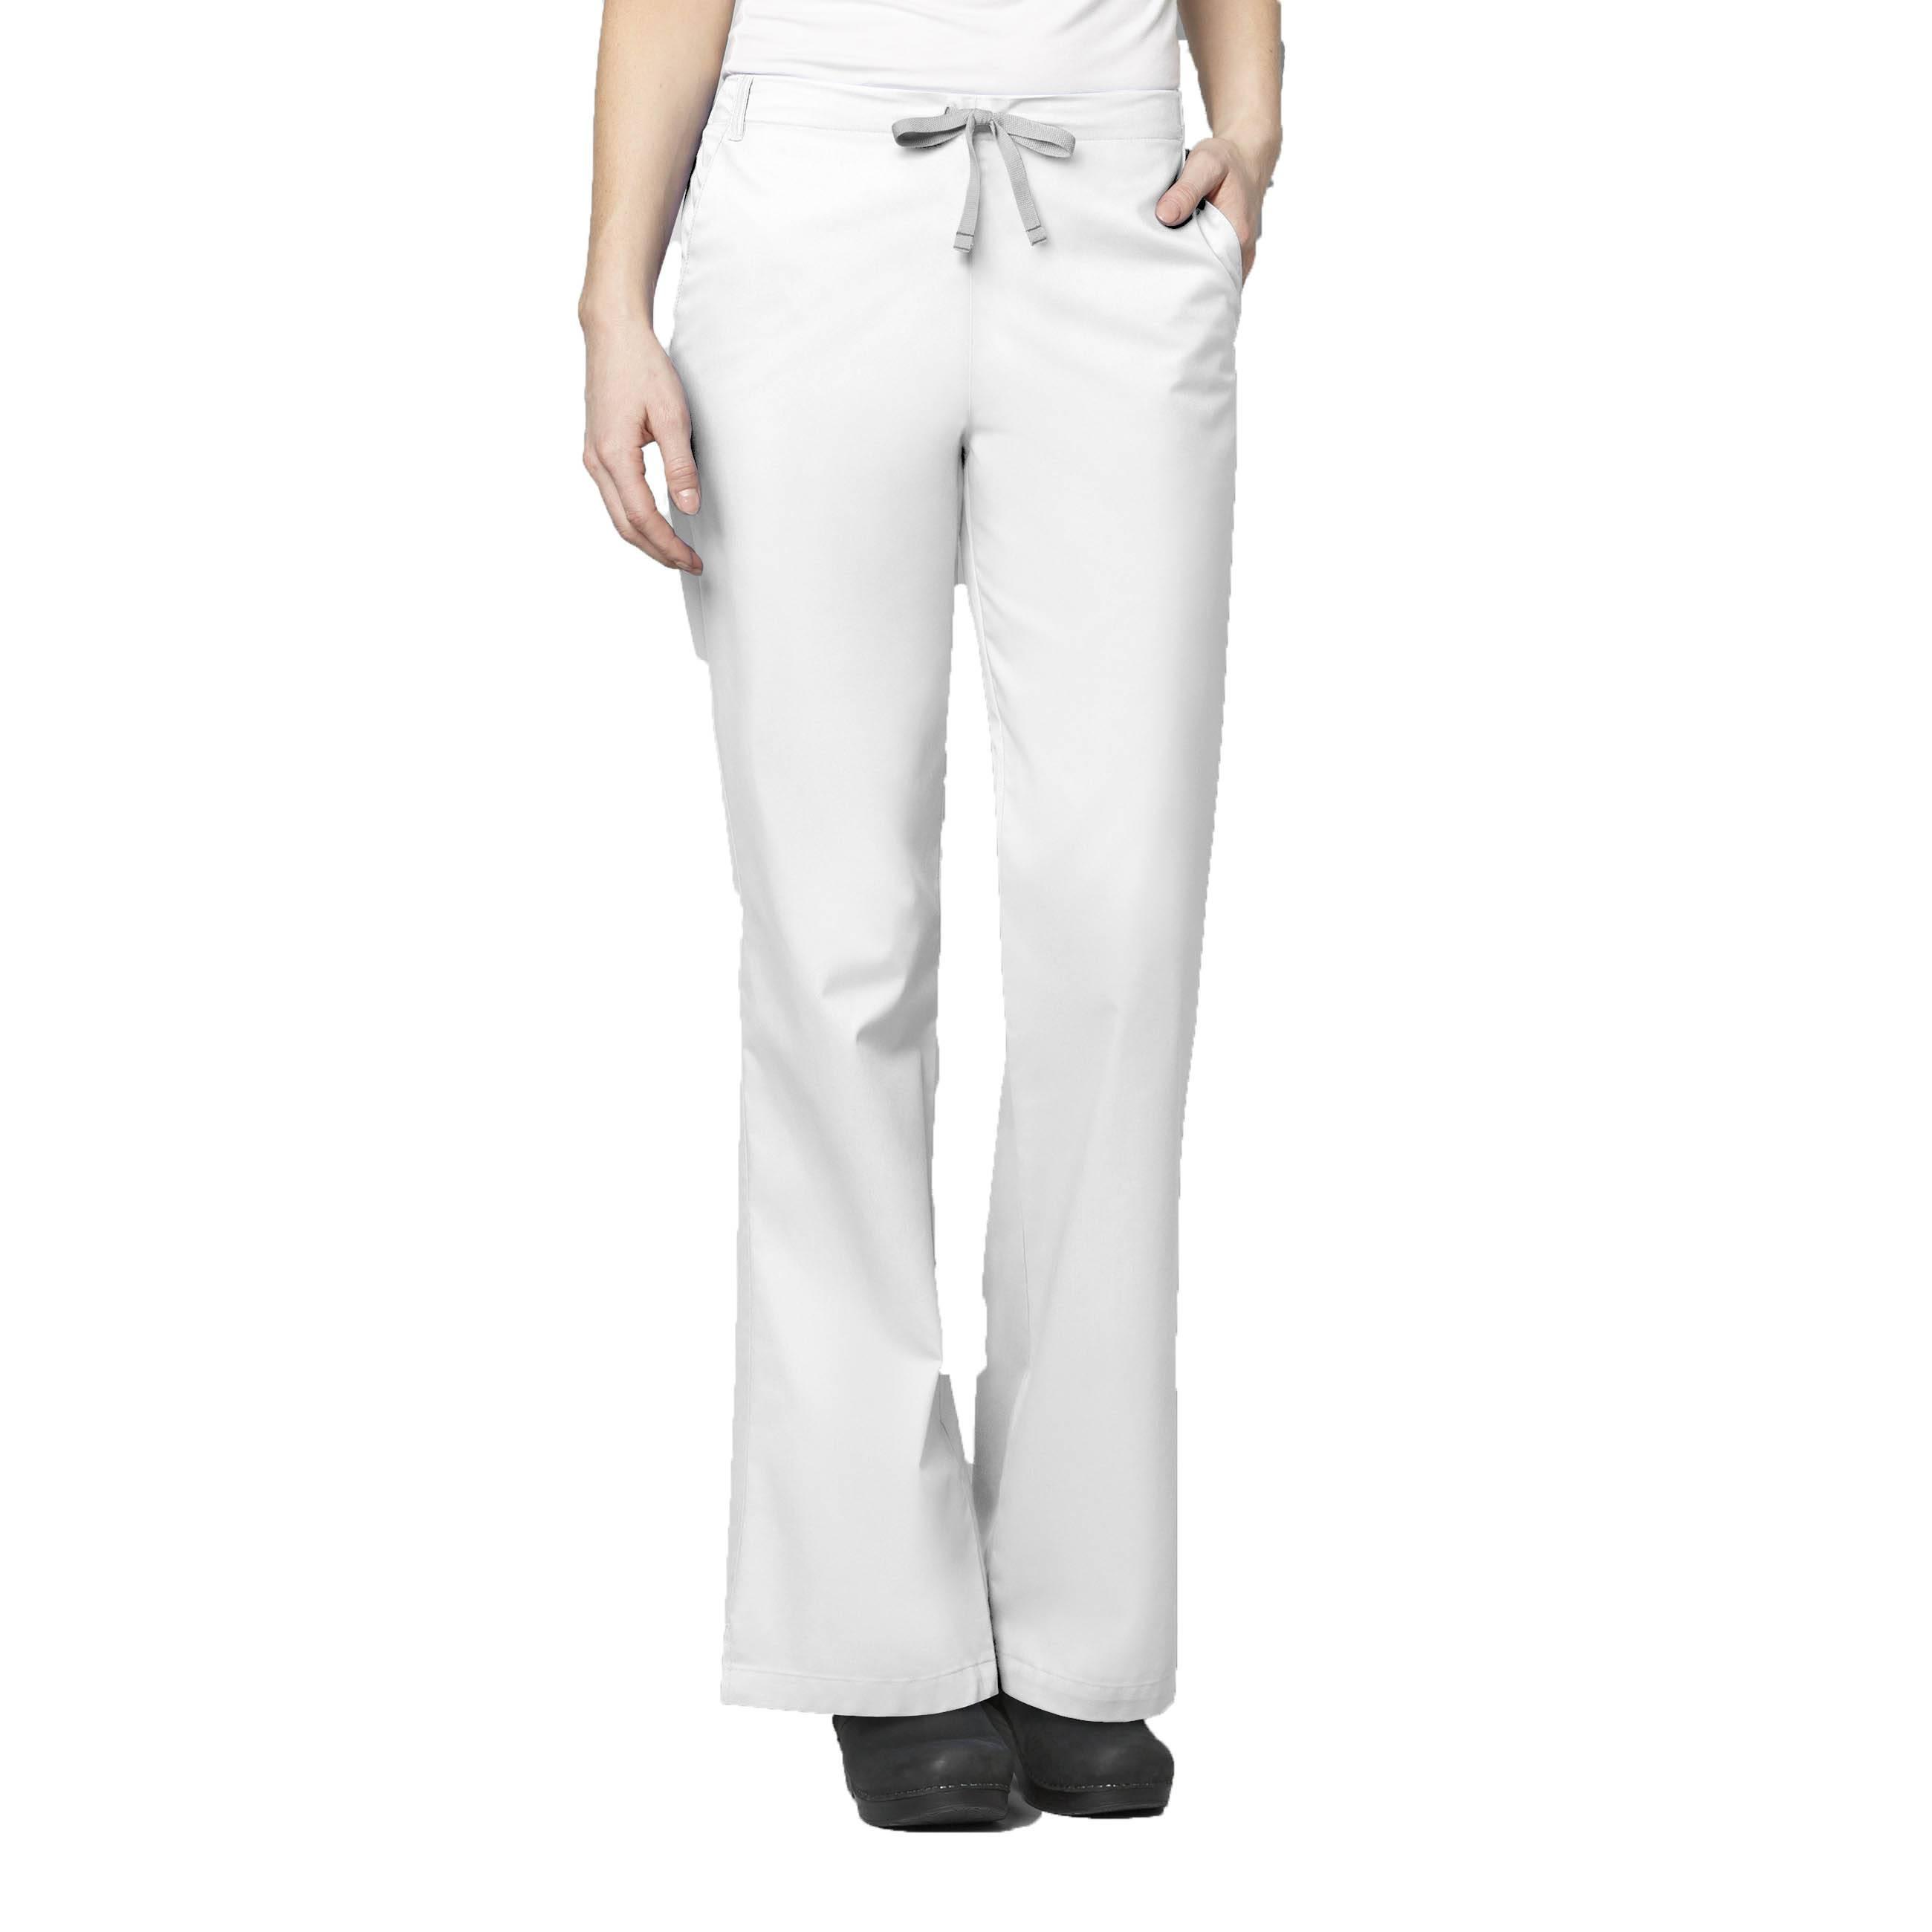 02b015145fd WonderWink 'wonderwork Flare Leg Pant' Scrub Bottoms White 2xl   eBay